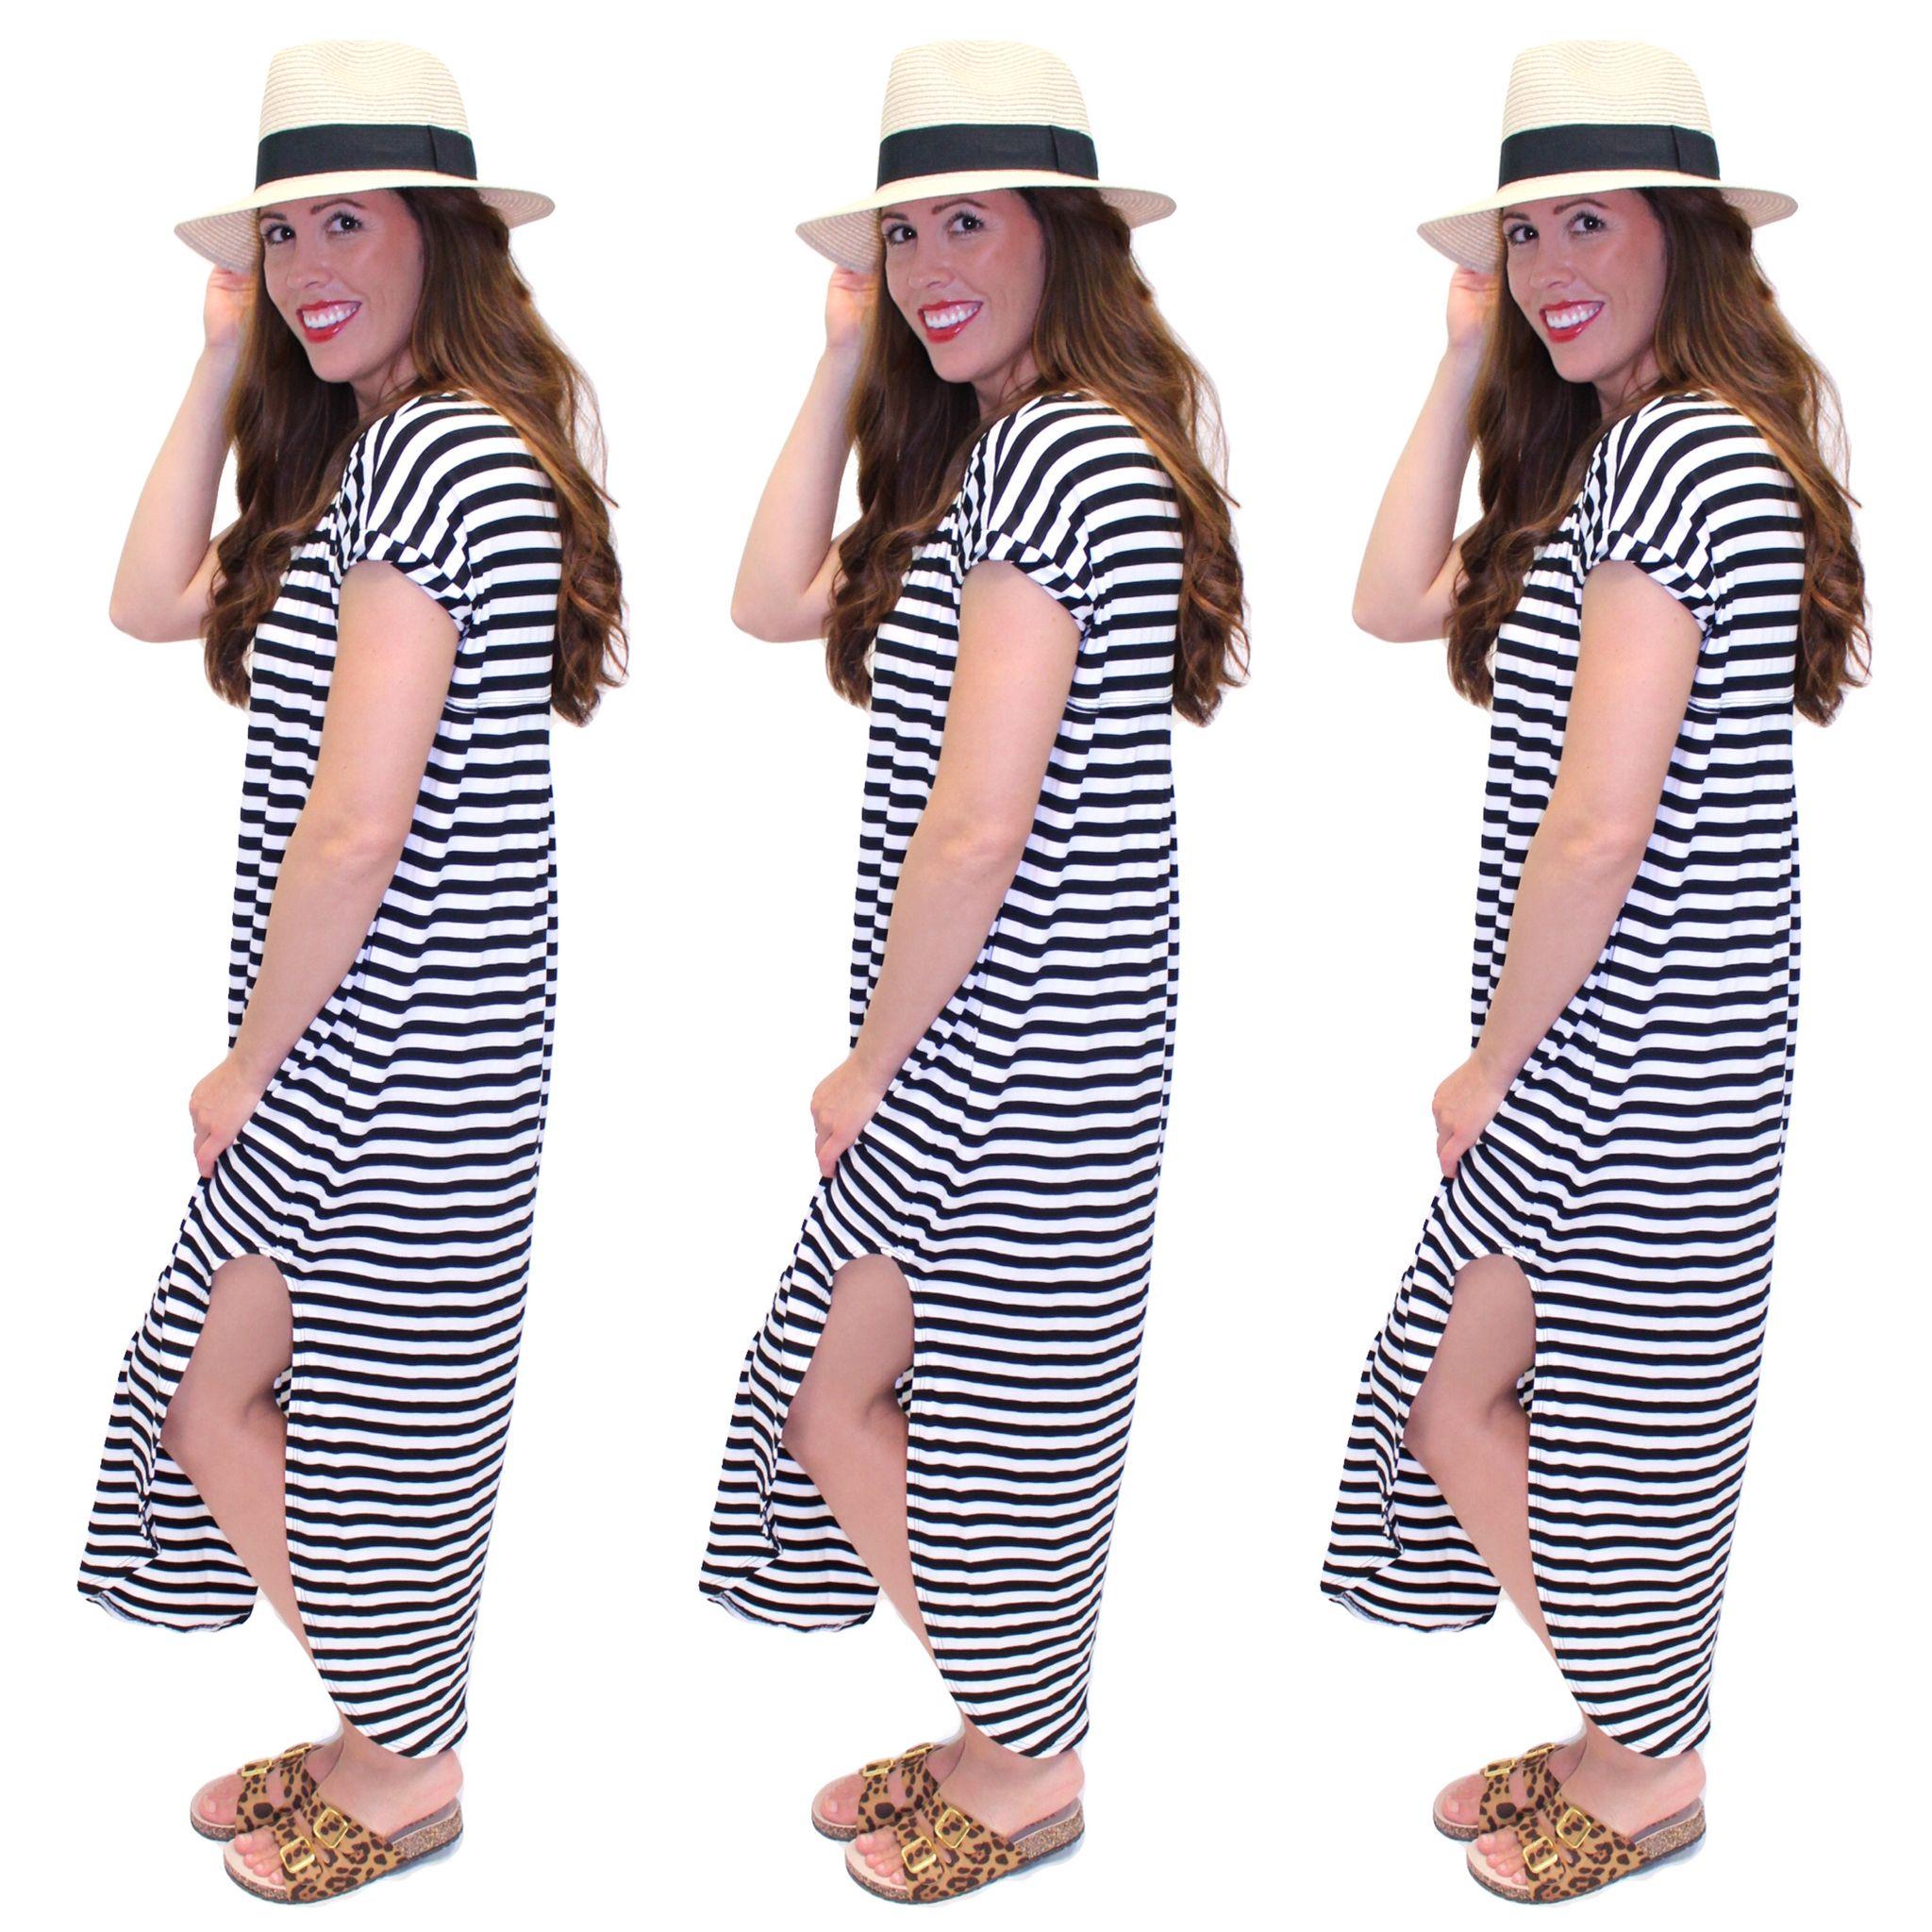 ::Summer Stripes:: Brooklyn Striped Maxi $42. (Online & In Store) Panama Hat $22. Leo Buckled Flat $38. (Online & In Store) #stripes #maxi #leopard #summer